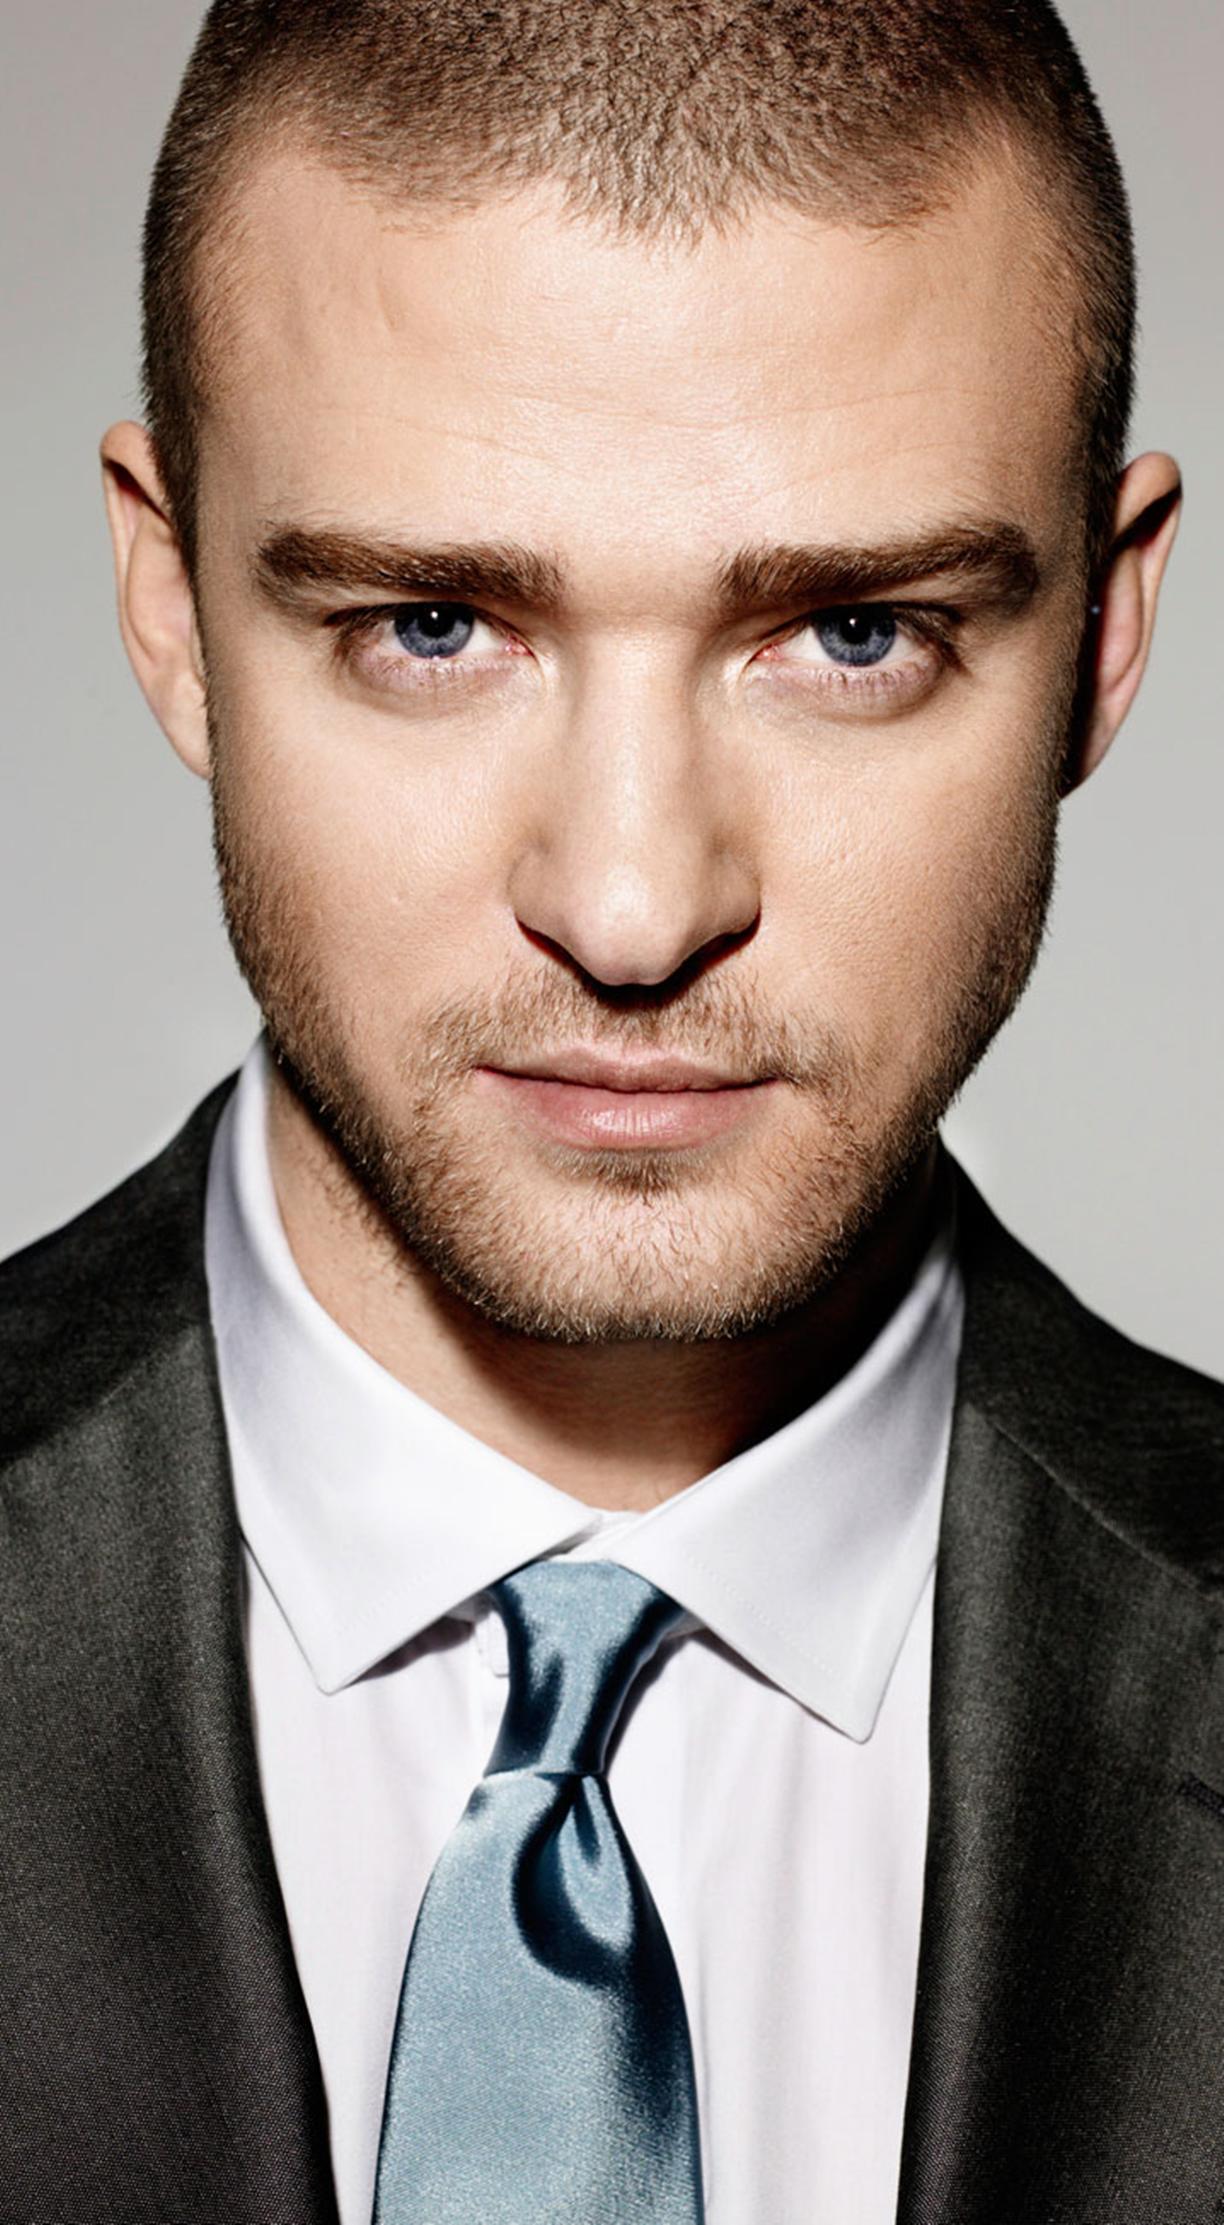 Justin Timberlake Justin Timberlake Timberlake Celebrities